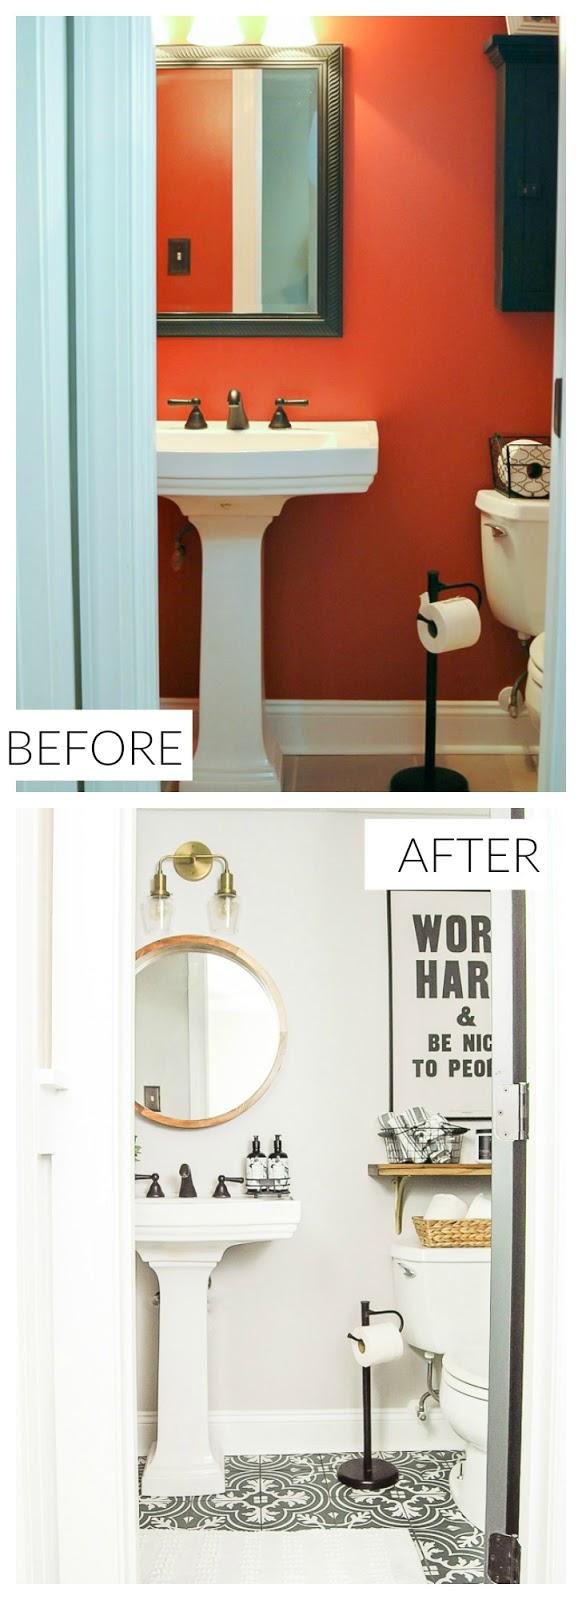 Gray and White Vintage Modern Bathroom Makeover.